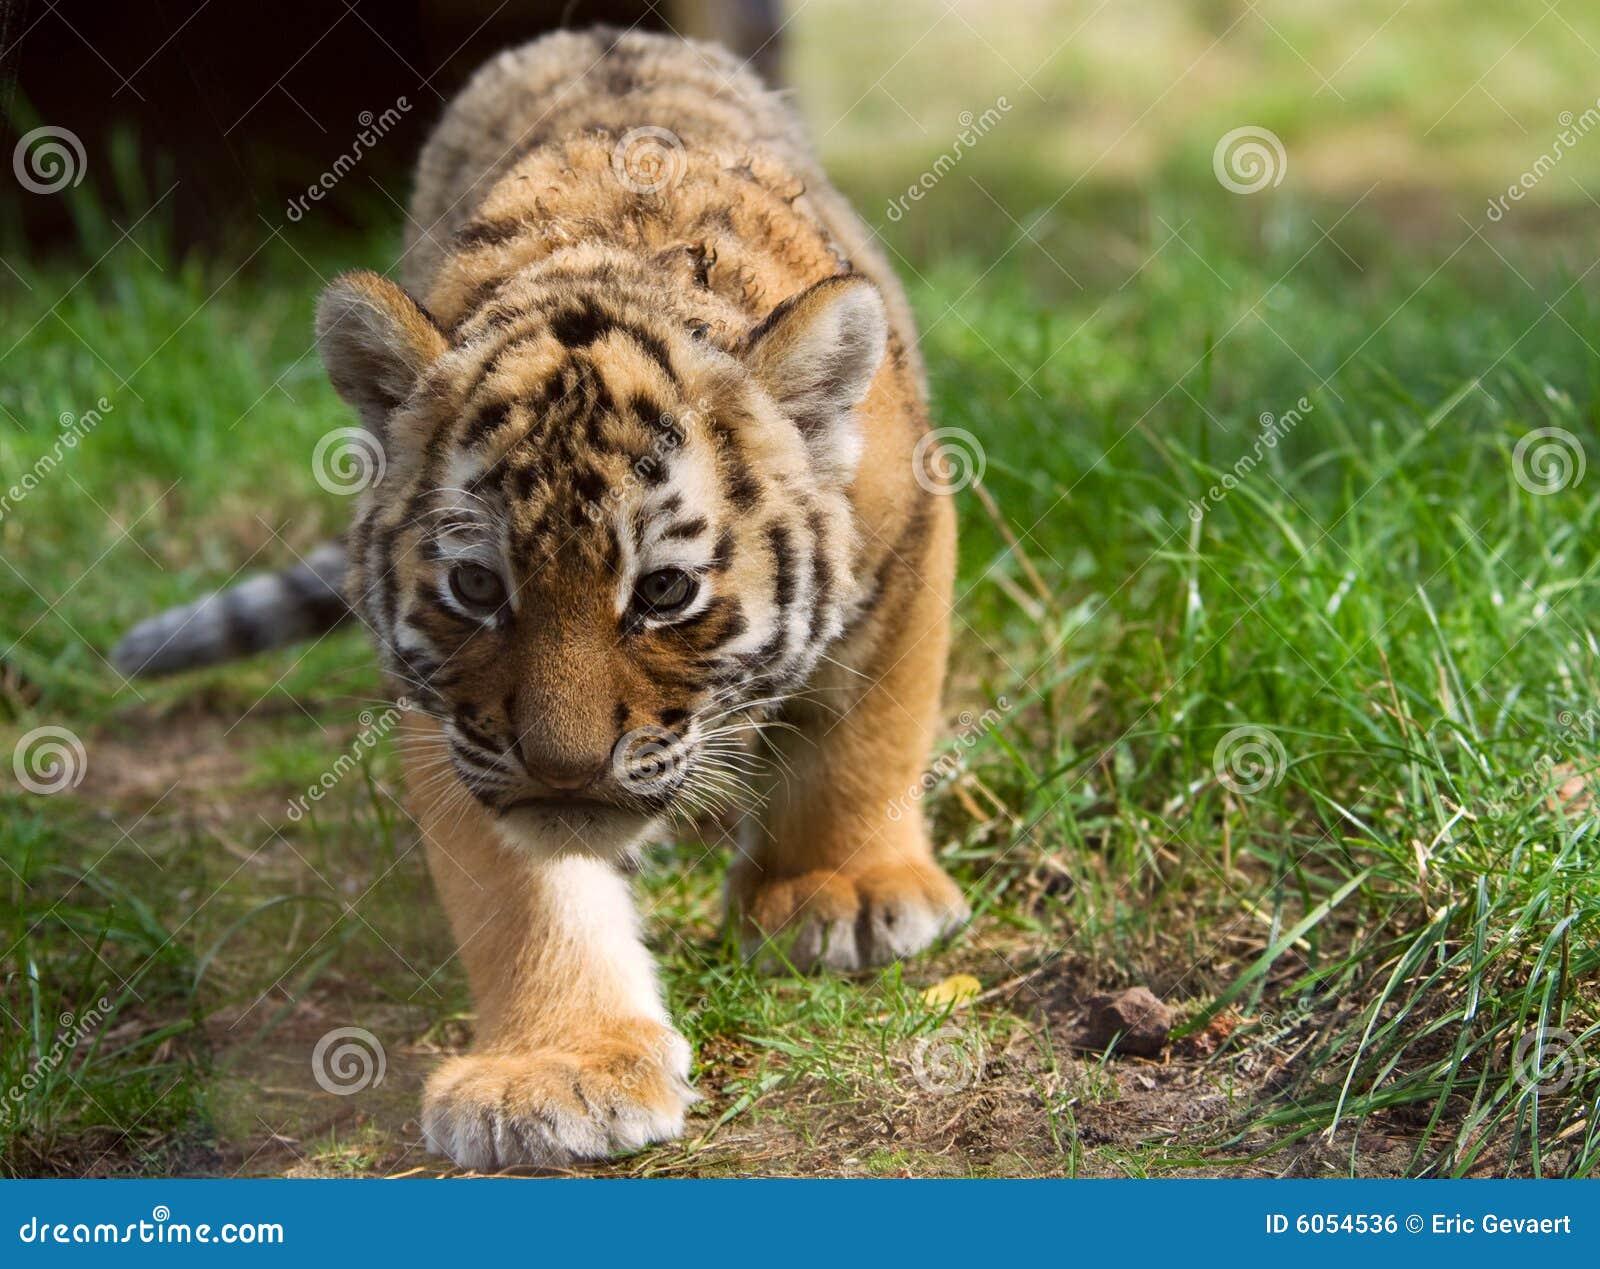 Cute Tiger Cub Holding Heart Vector Illustration ... Cute Siberian Tiger Cubs